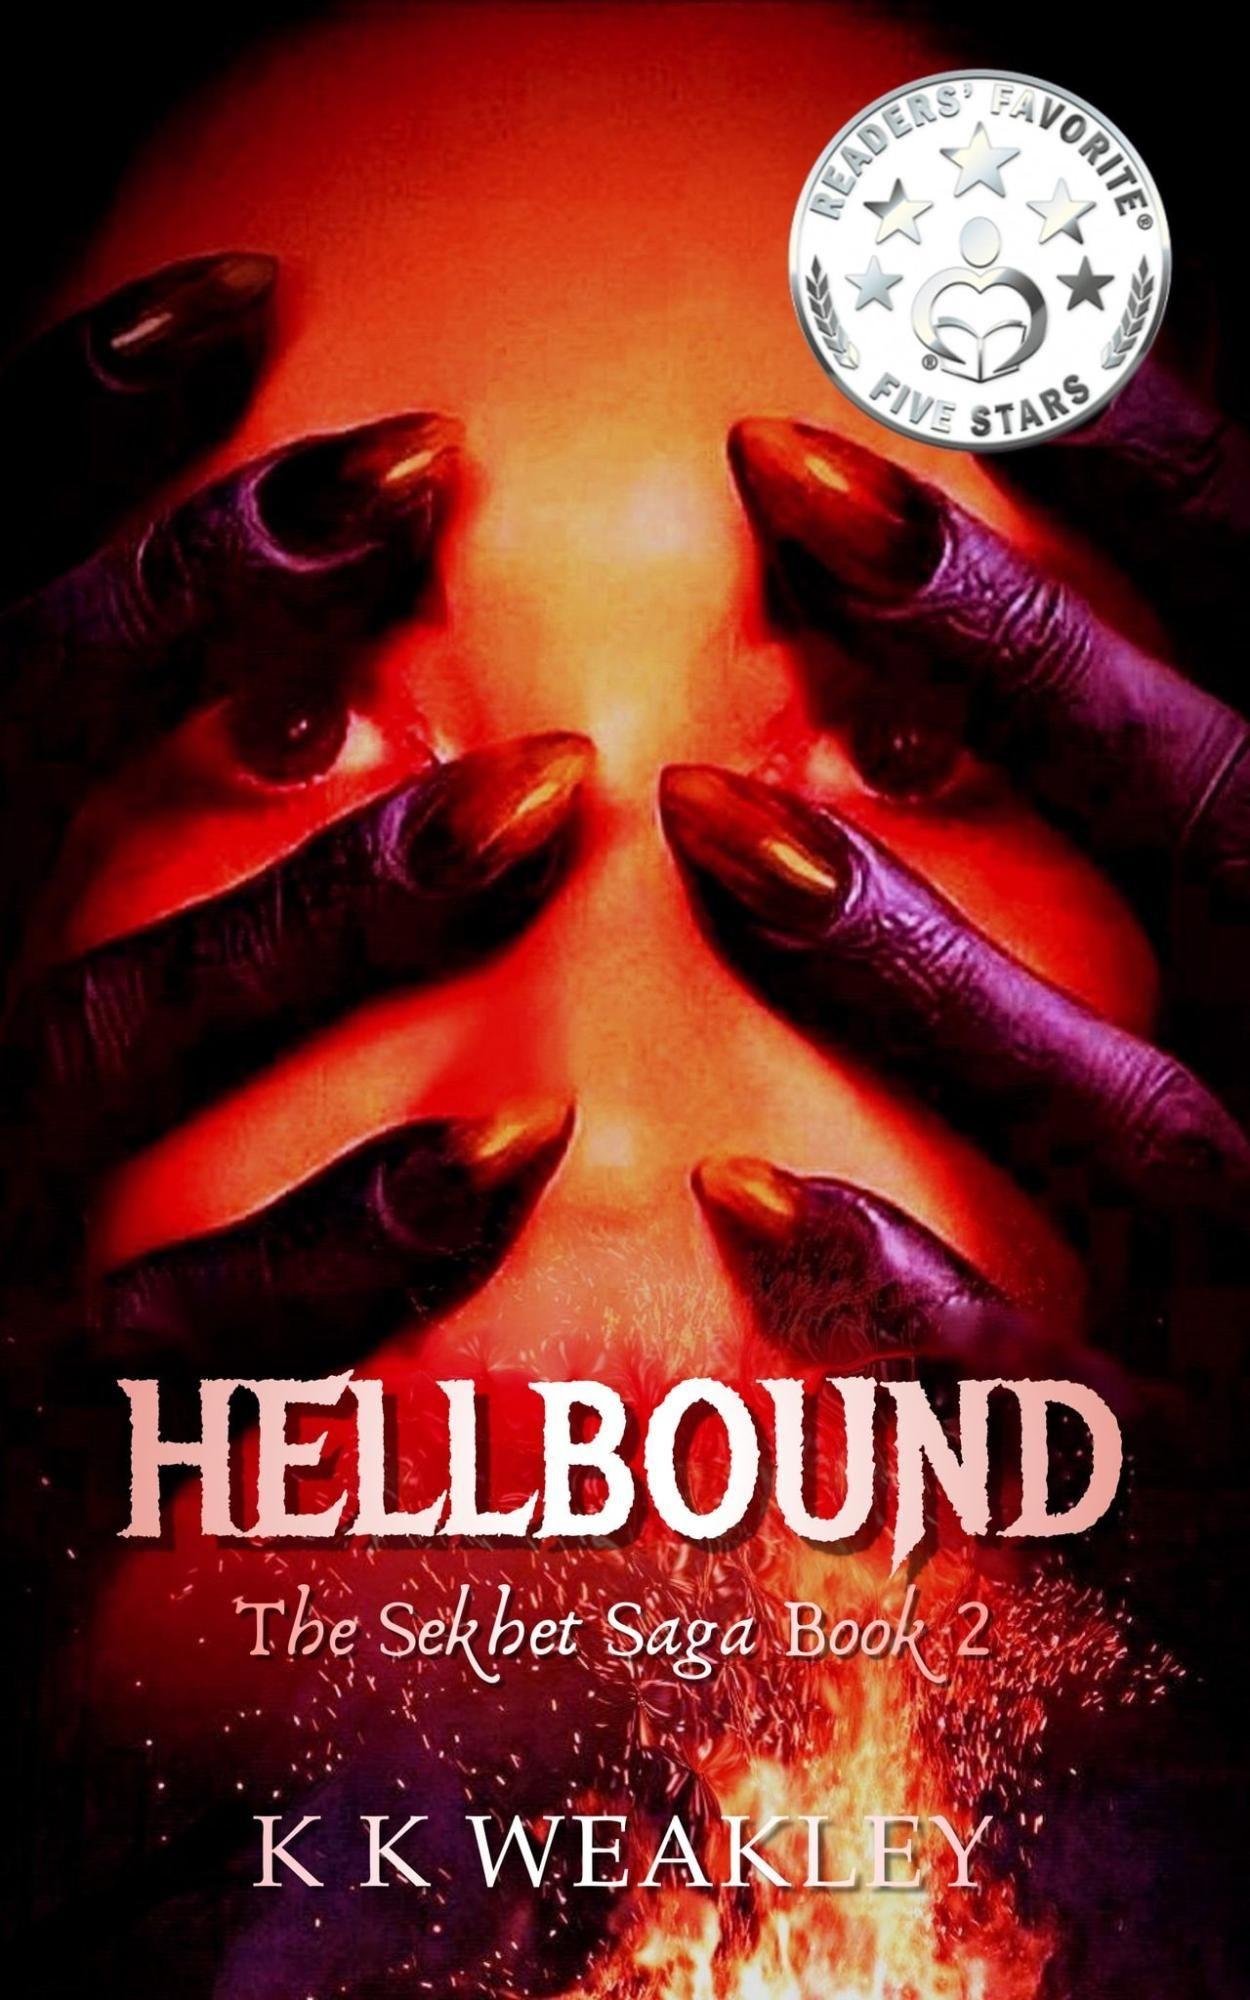 HELLBOUND BOOK 2 - SEKHET SAGA's Ebook Image